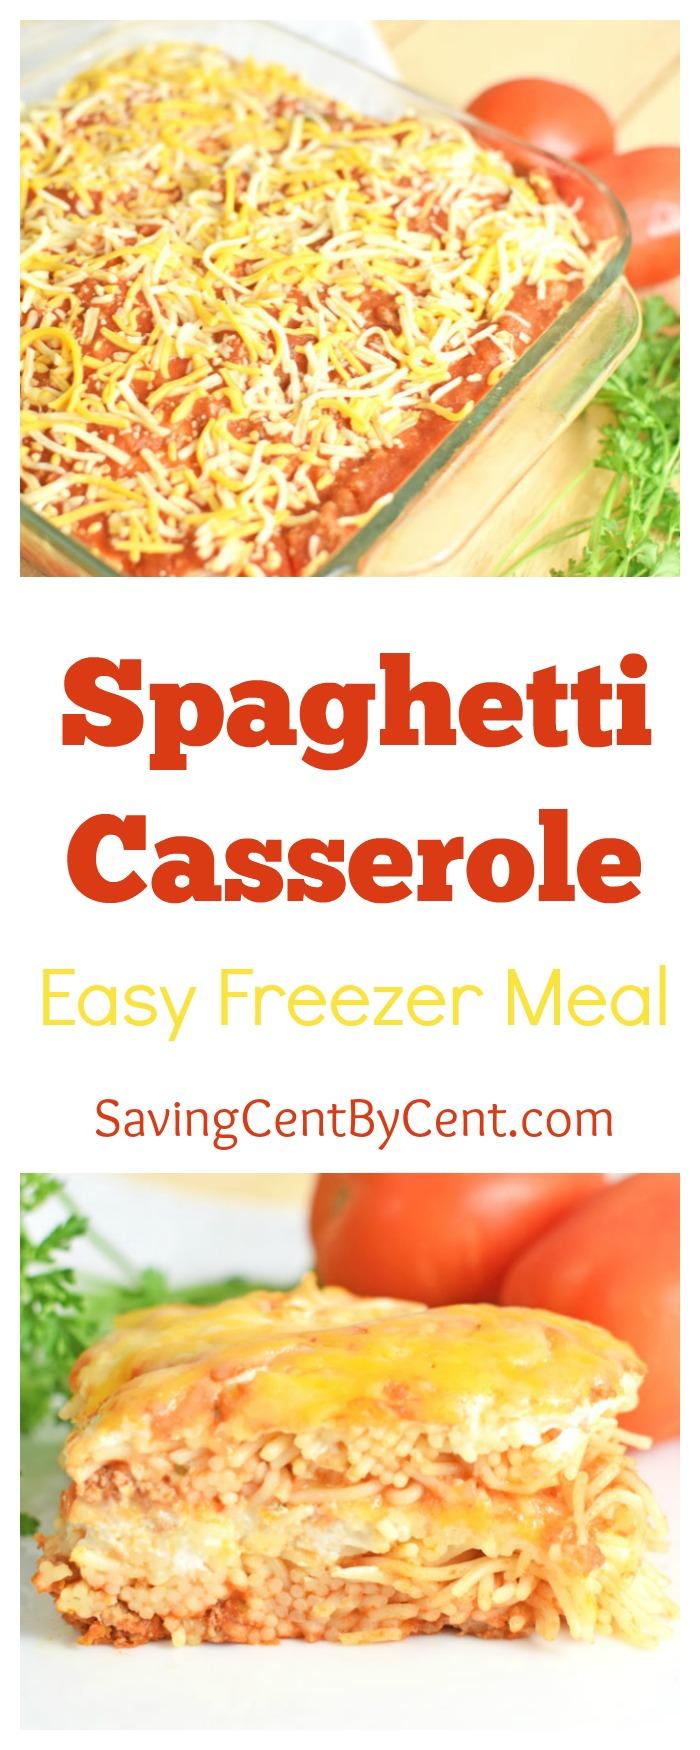 And Easy Freezer Meal Spaghetti Casserole